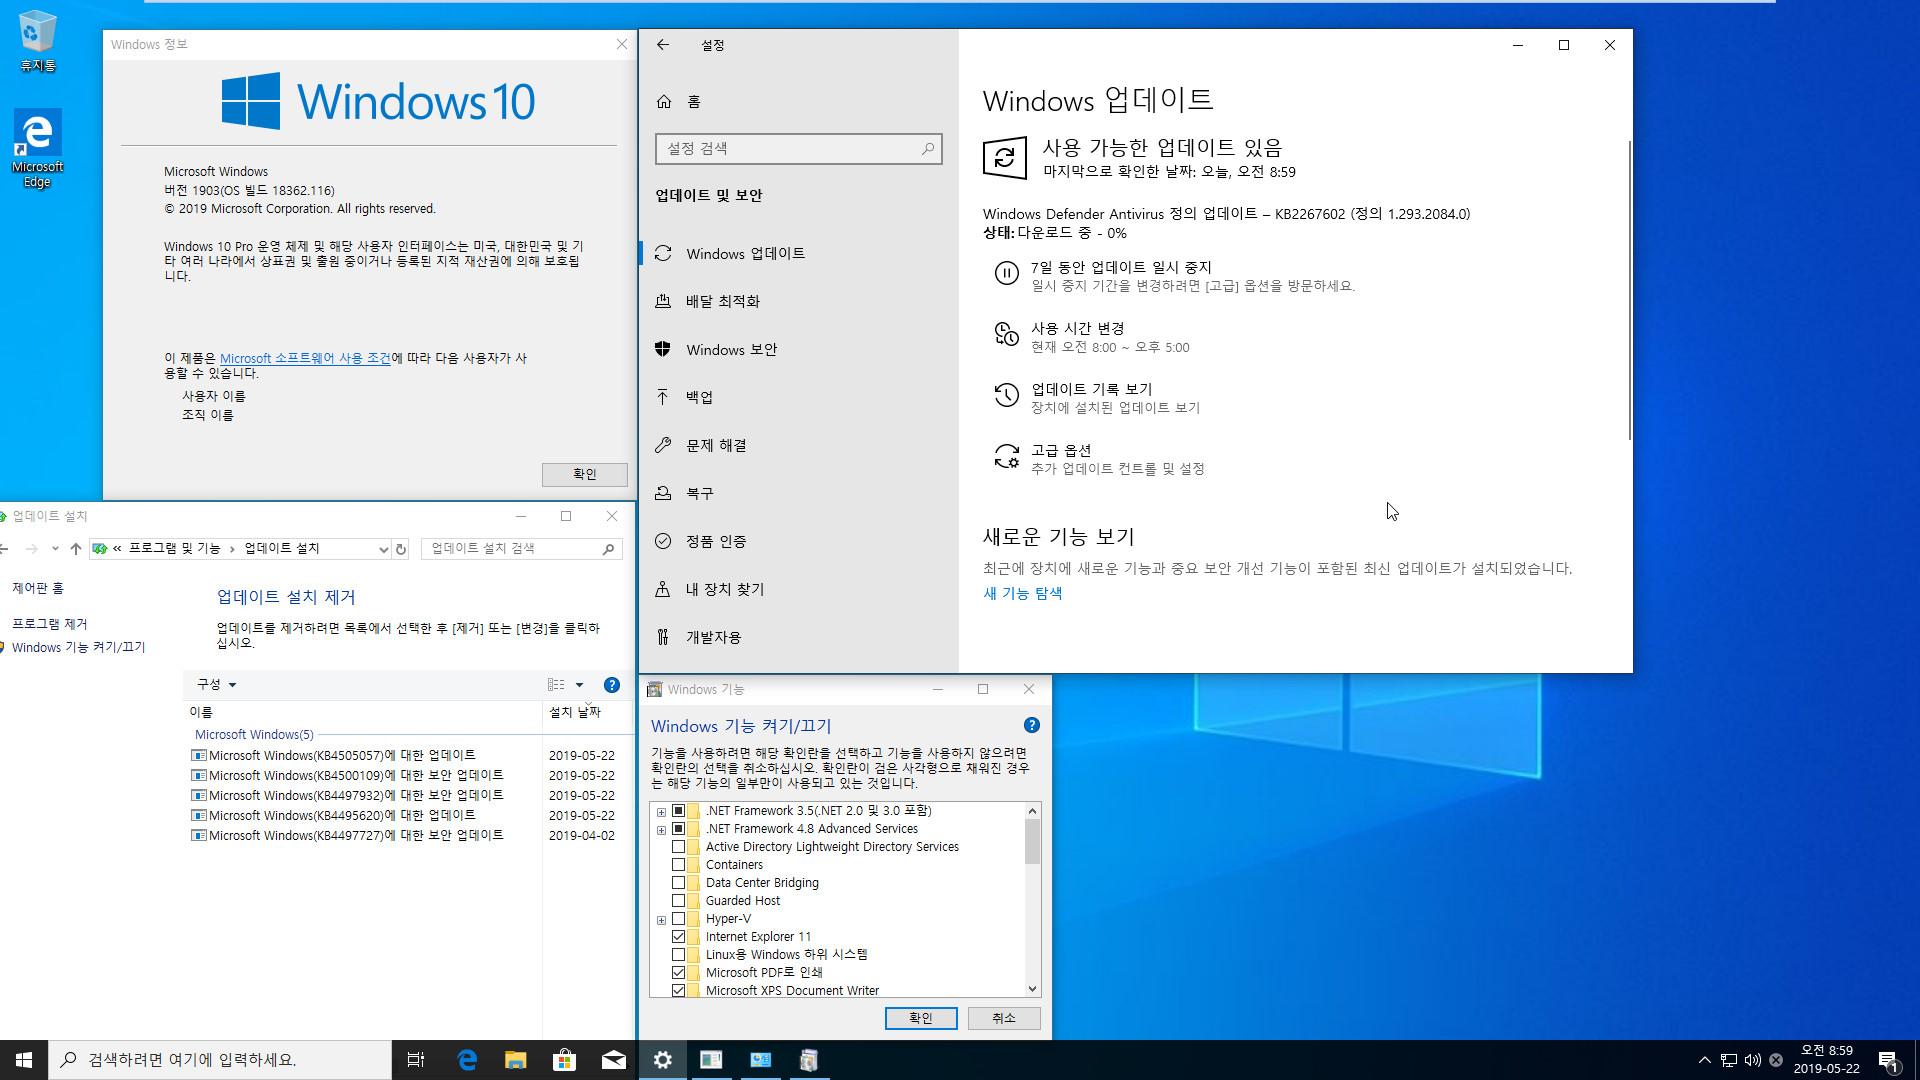 Windows 10 버전 1903 누적 업데이트 KB4505057 (OS 빌드 18362.116) [2019-05-19 일자] 통합중 입니다 - 정식 출시 기념으로 2019-05-22_085929.jpg